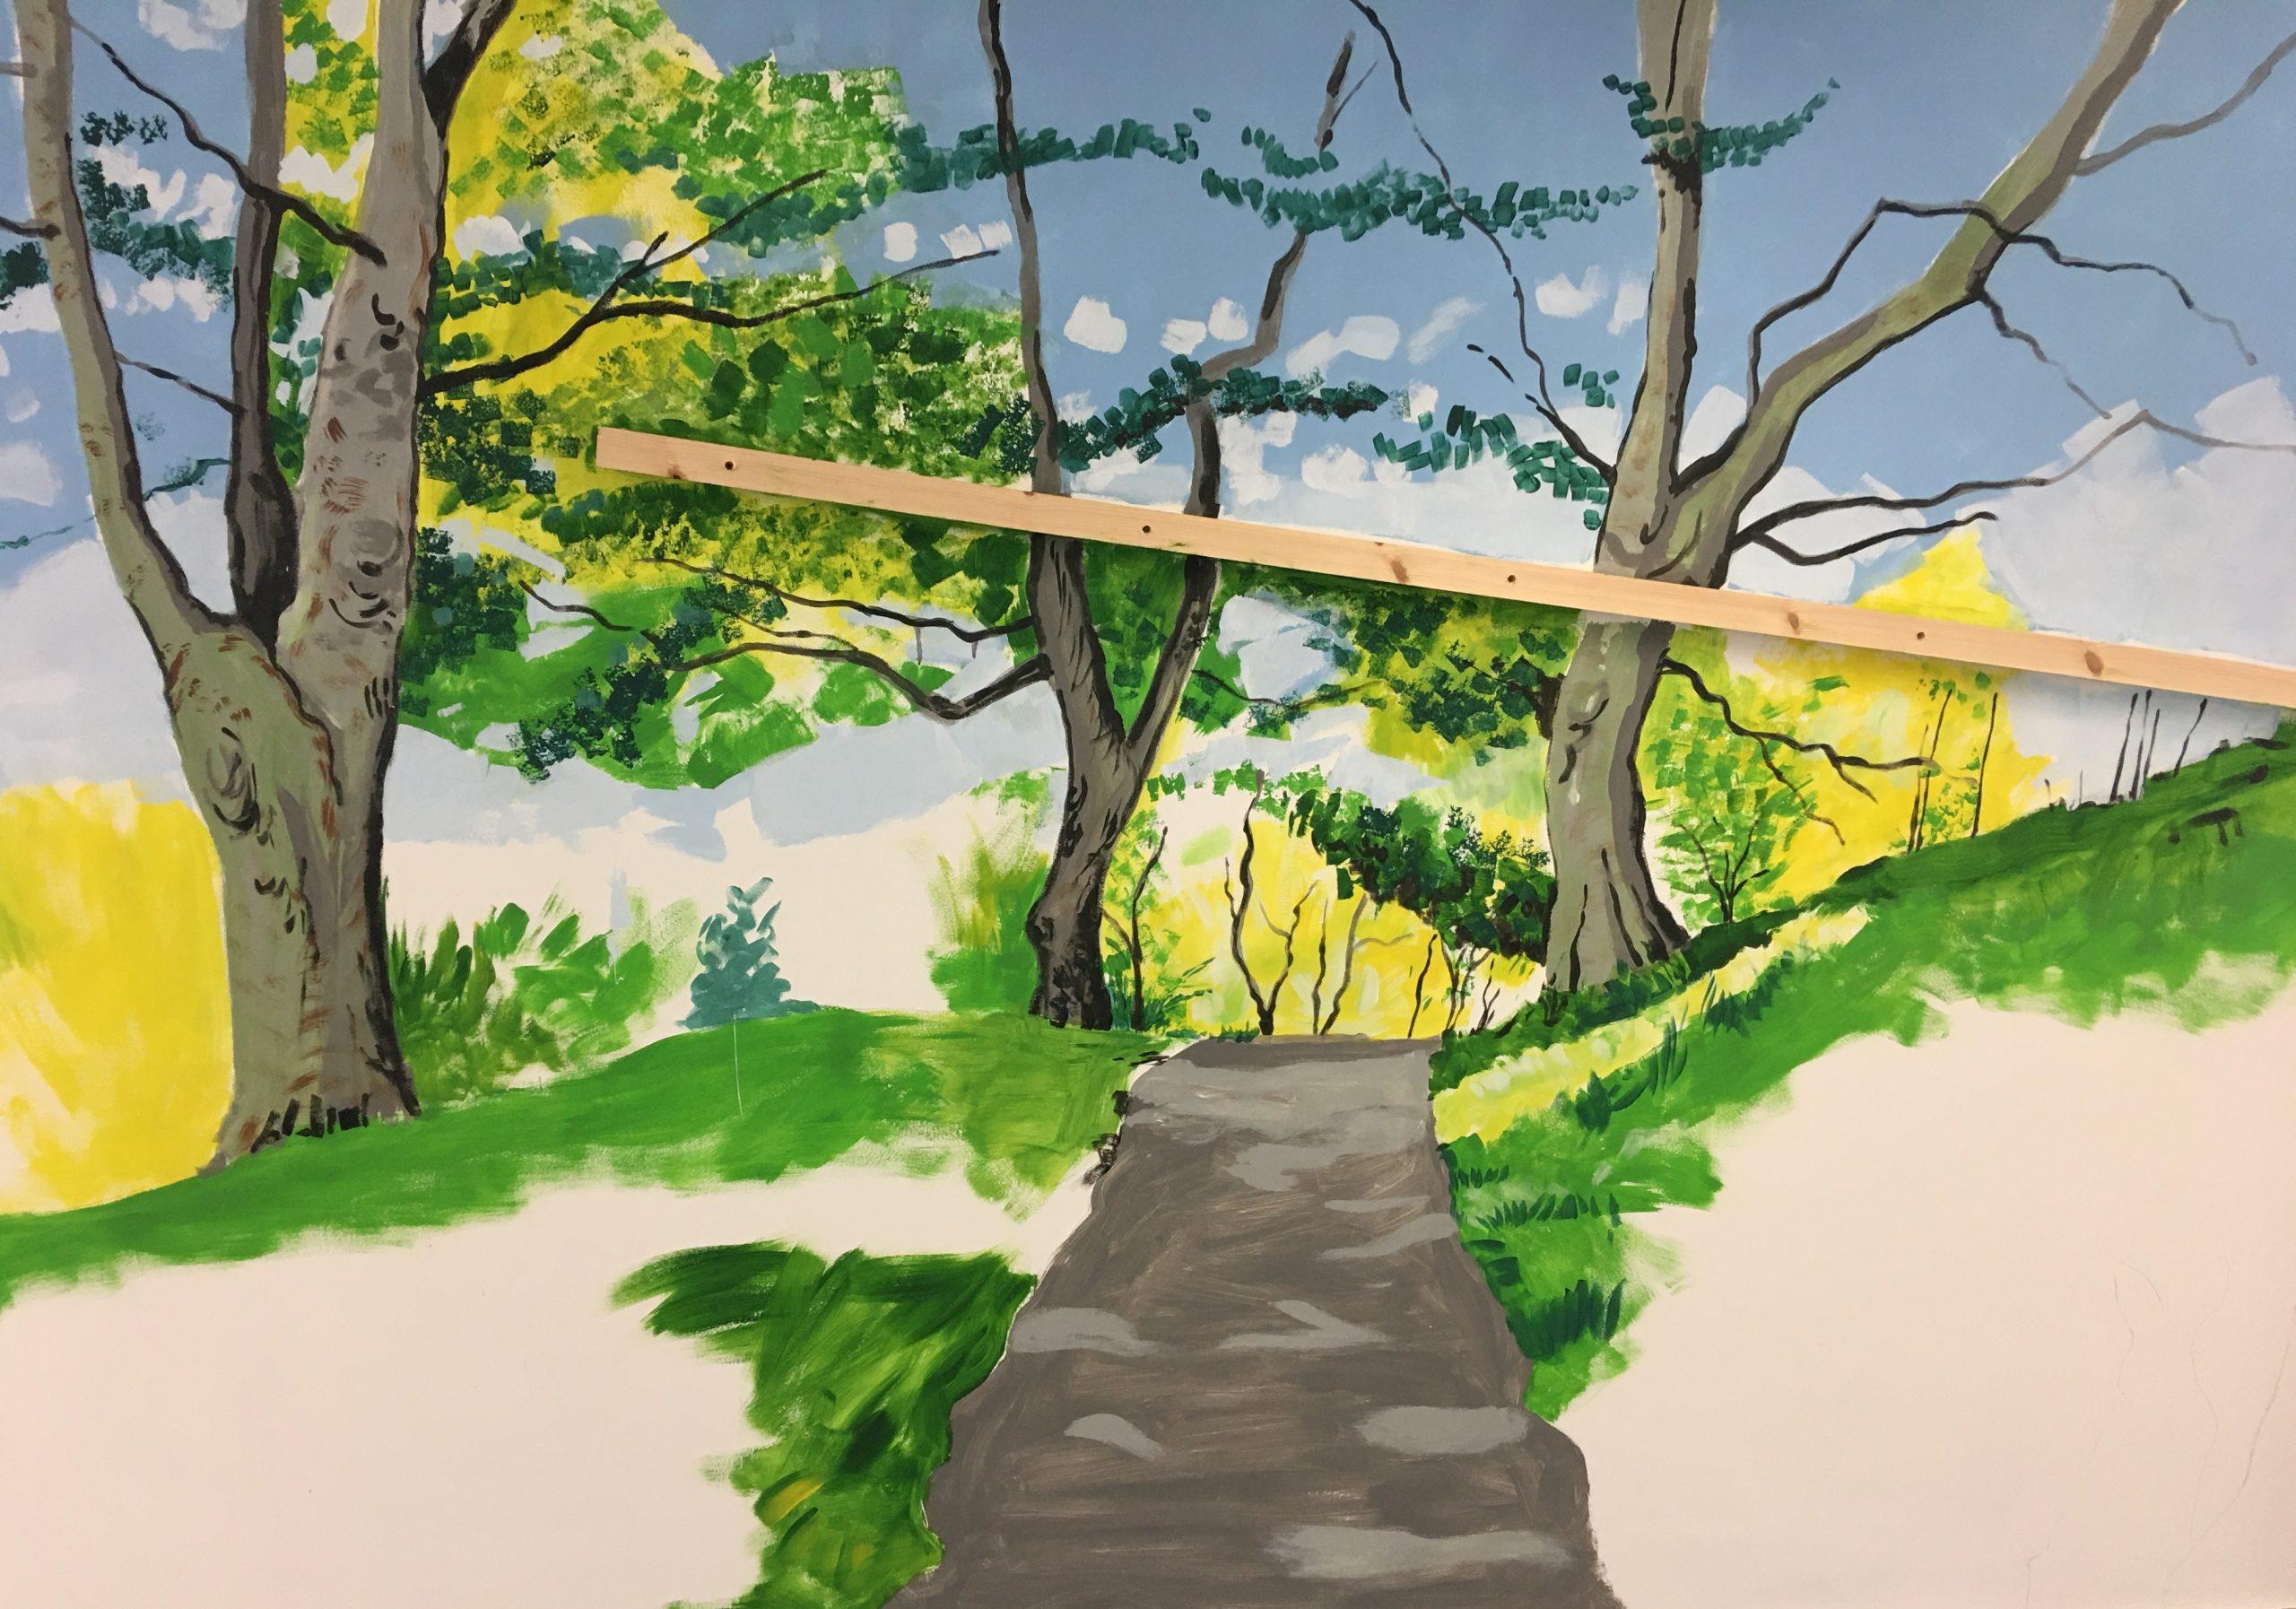 New wall mural for Linskill Nursery